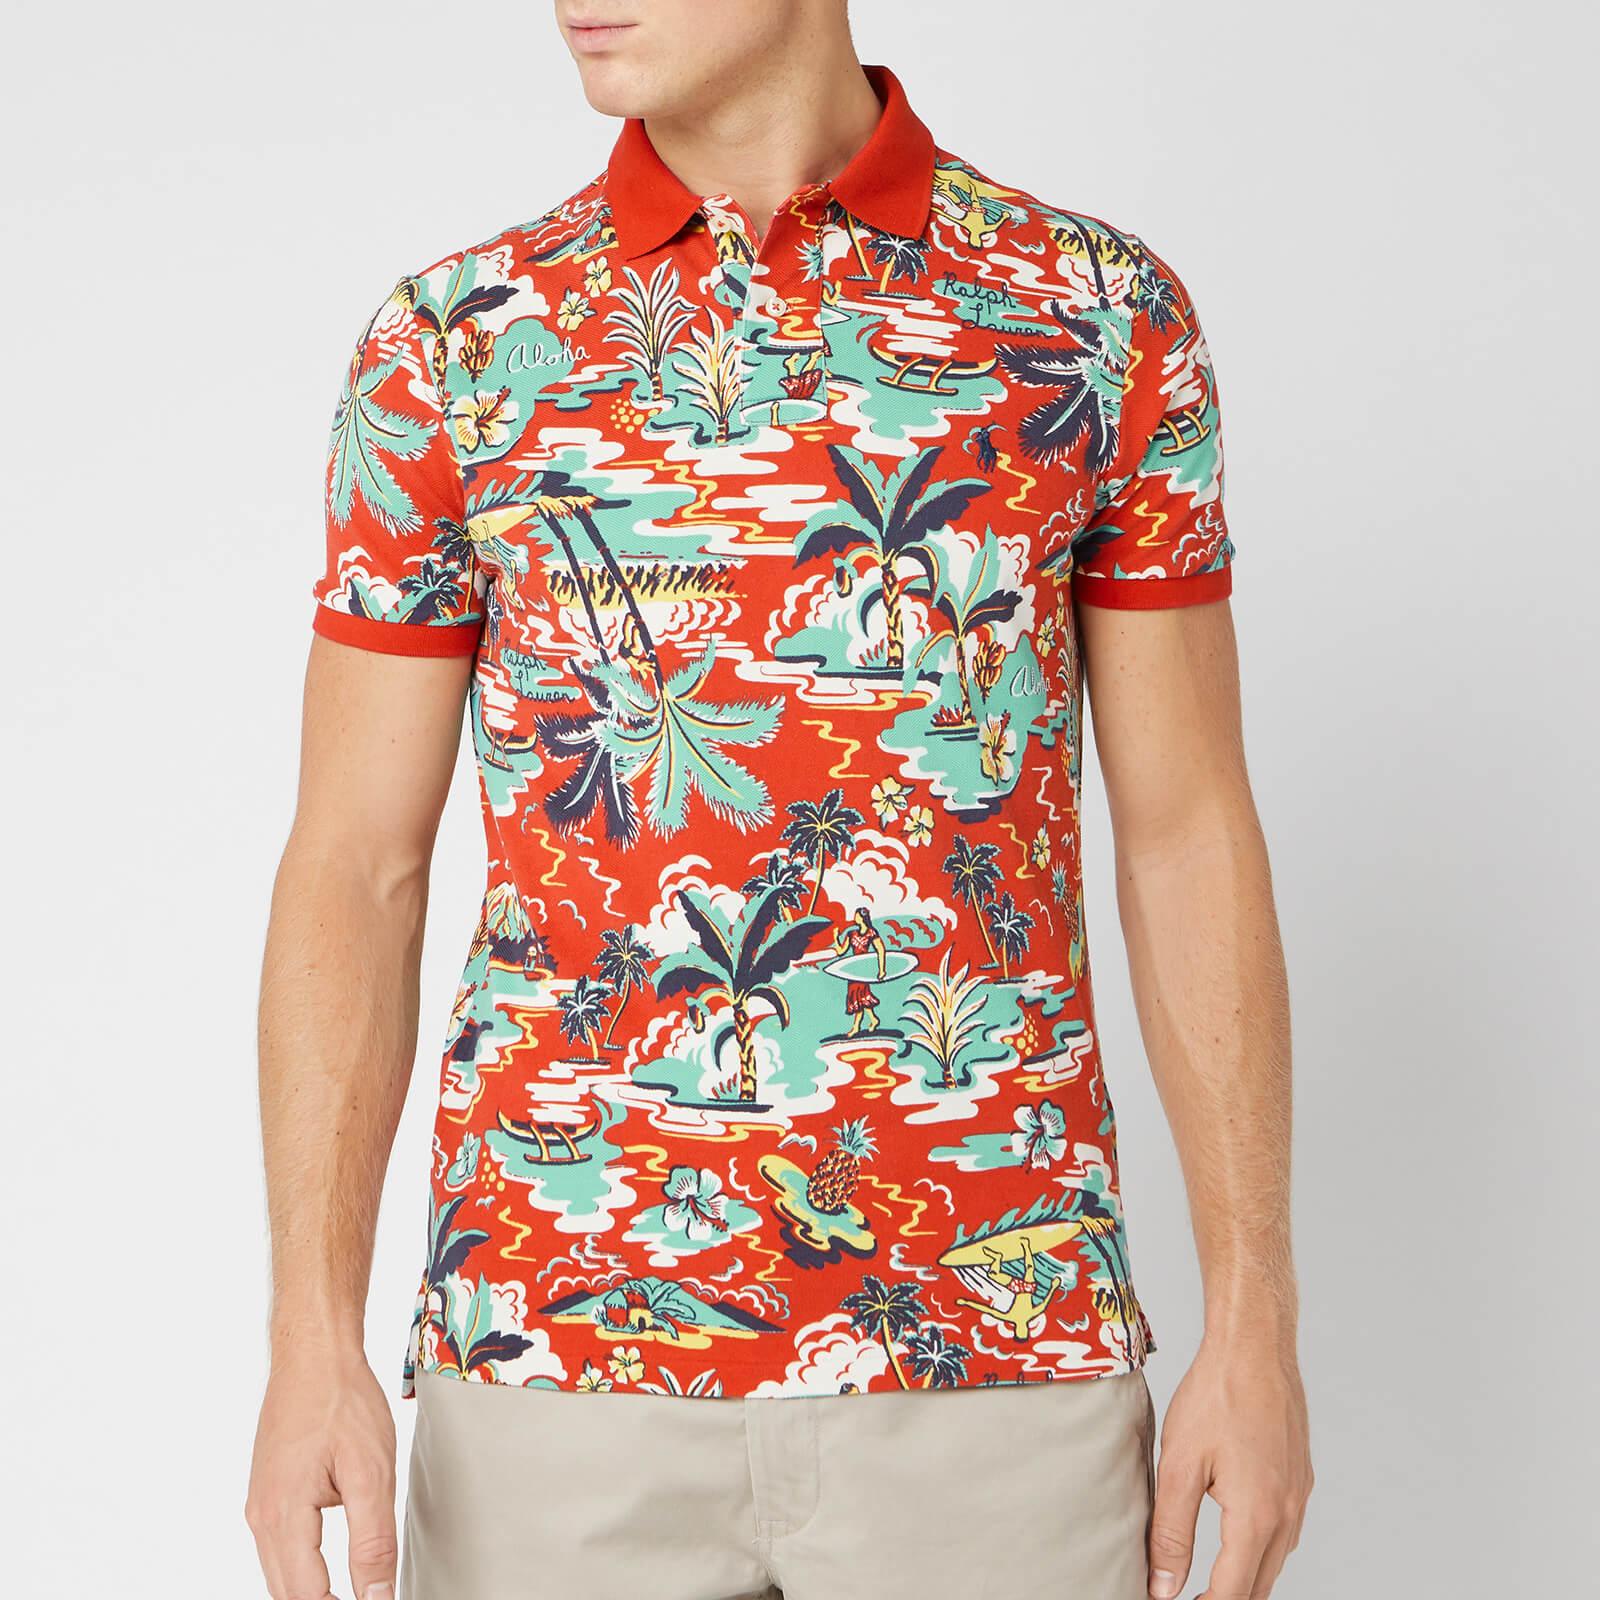 Ralph Men's Mesh Vintage Polo Lauren Palm Shirt Island I6yvgYfb7